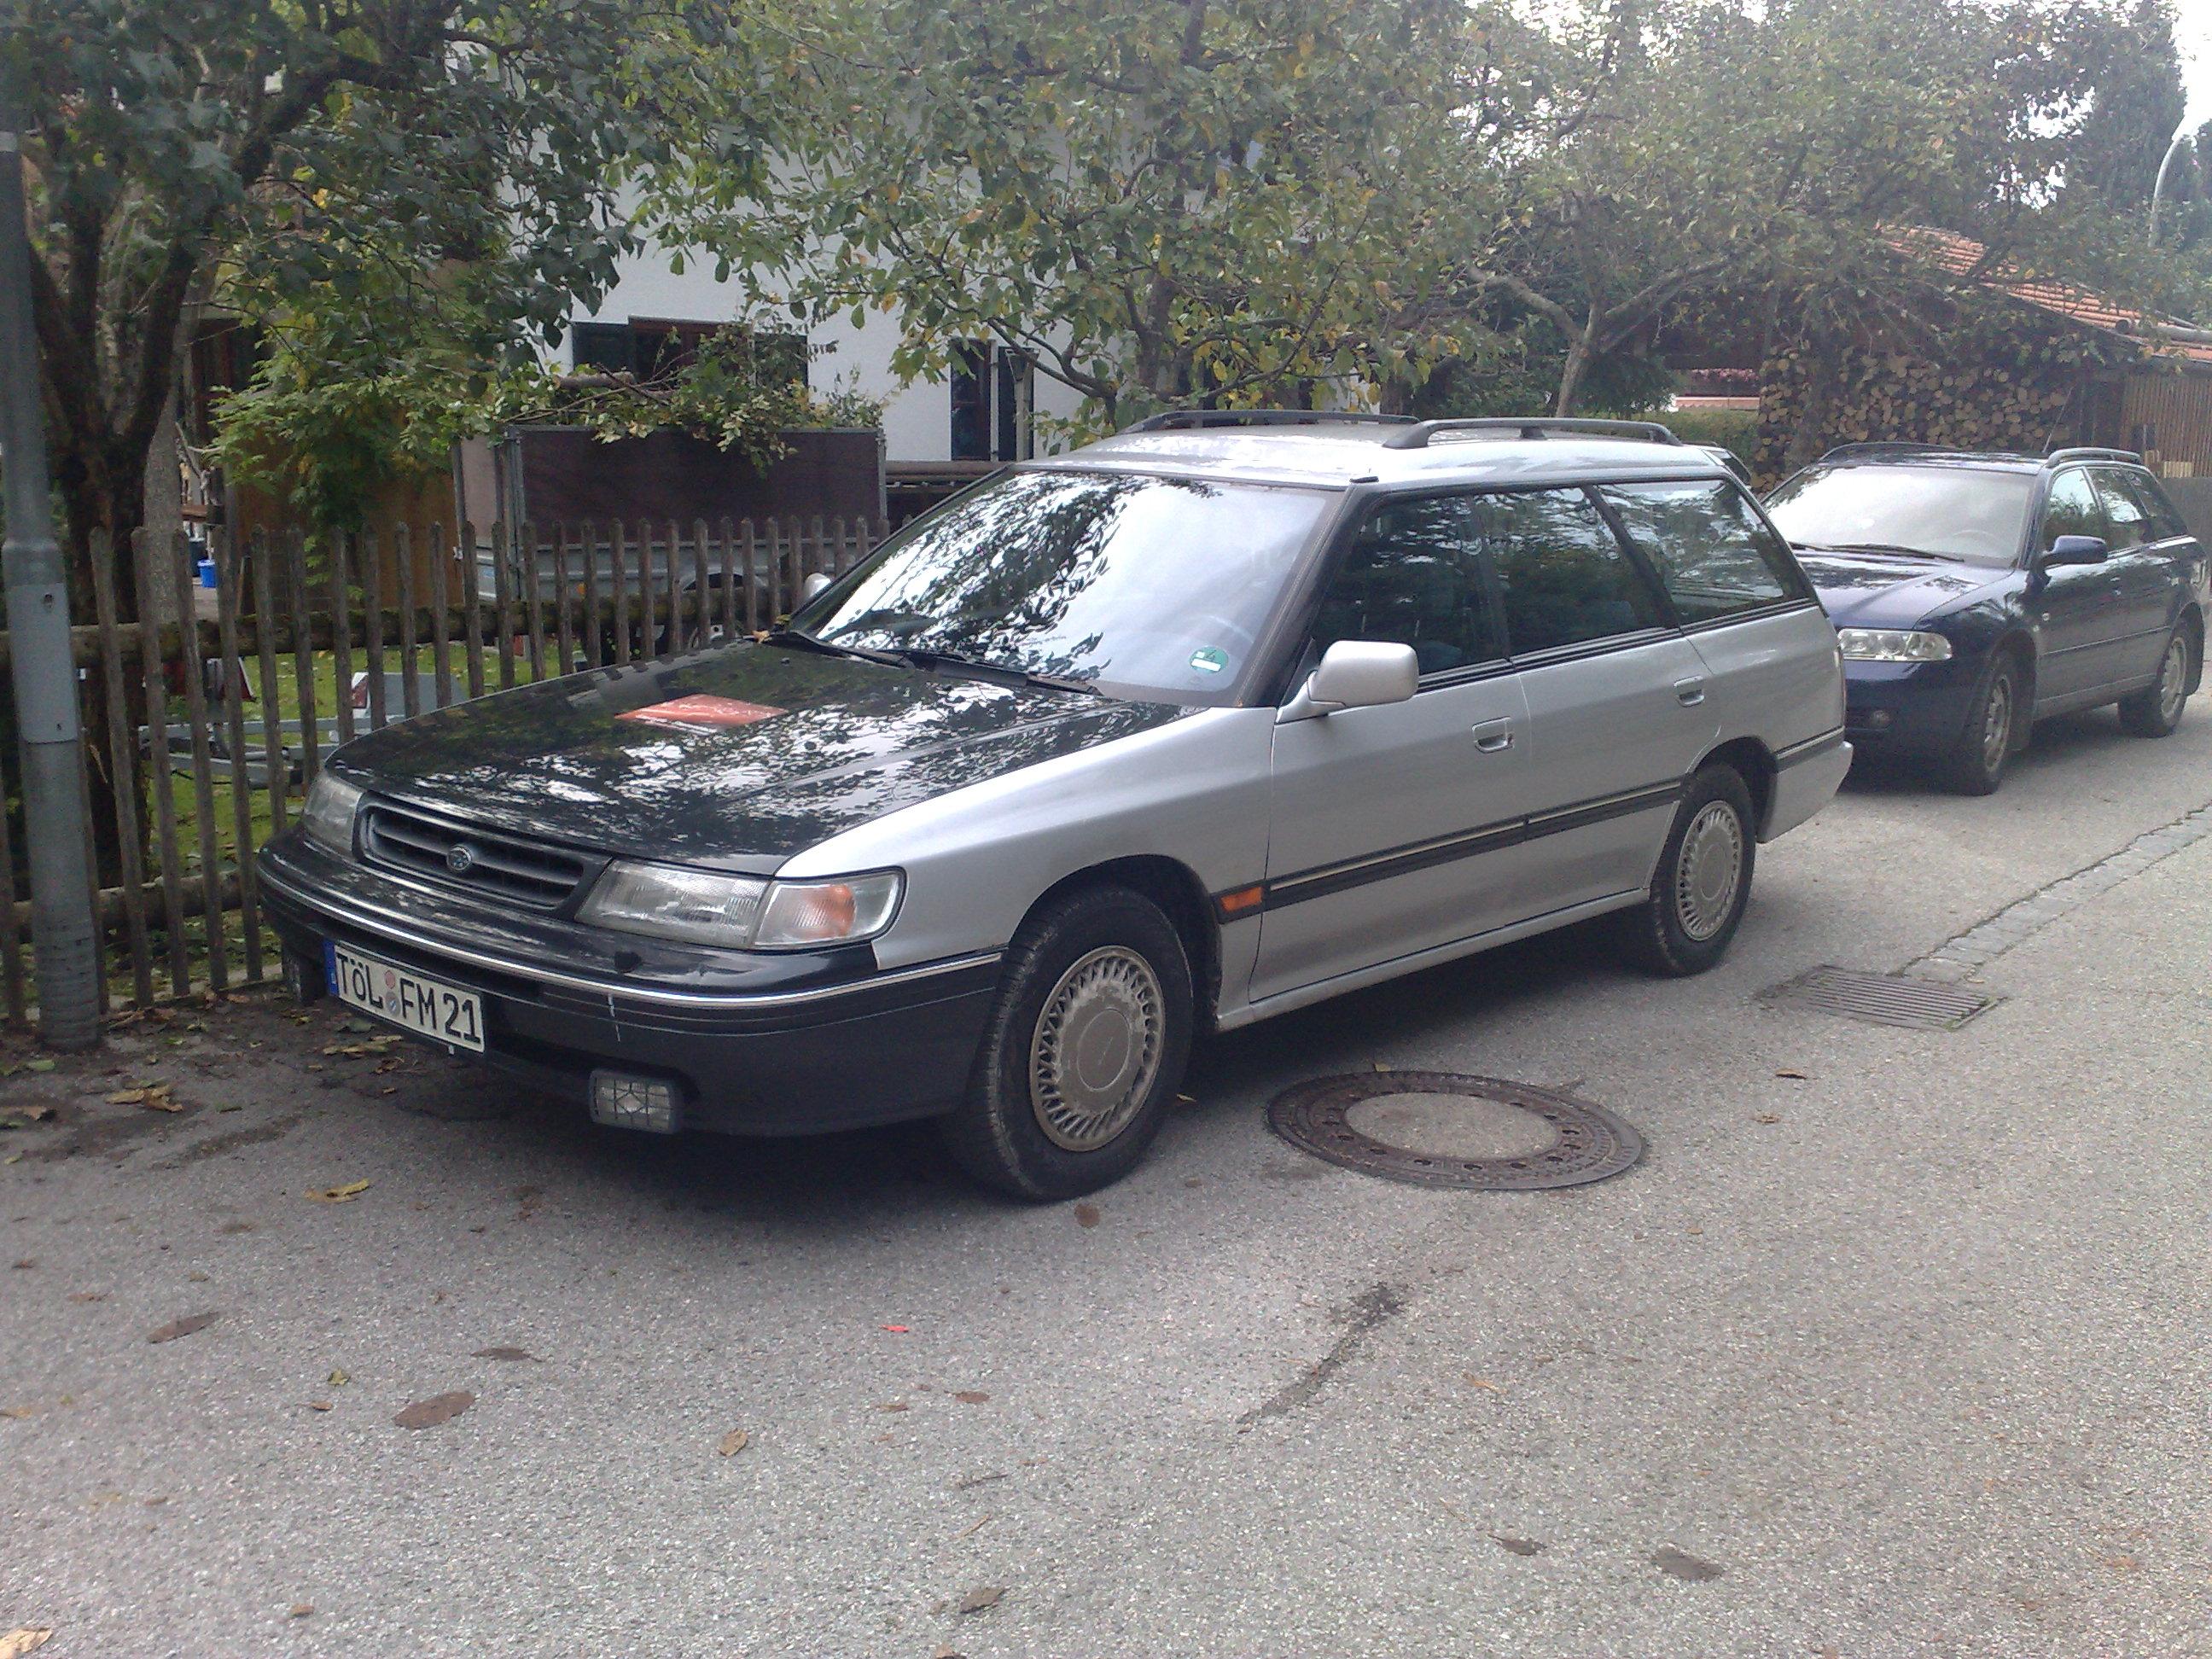 Erstes Eastside-Wüstenmobil - Ein Subaru Legacy